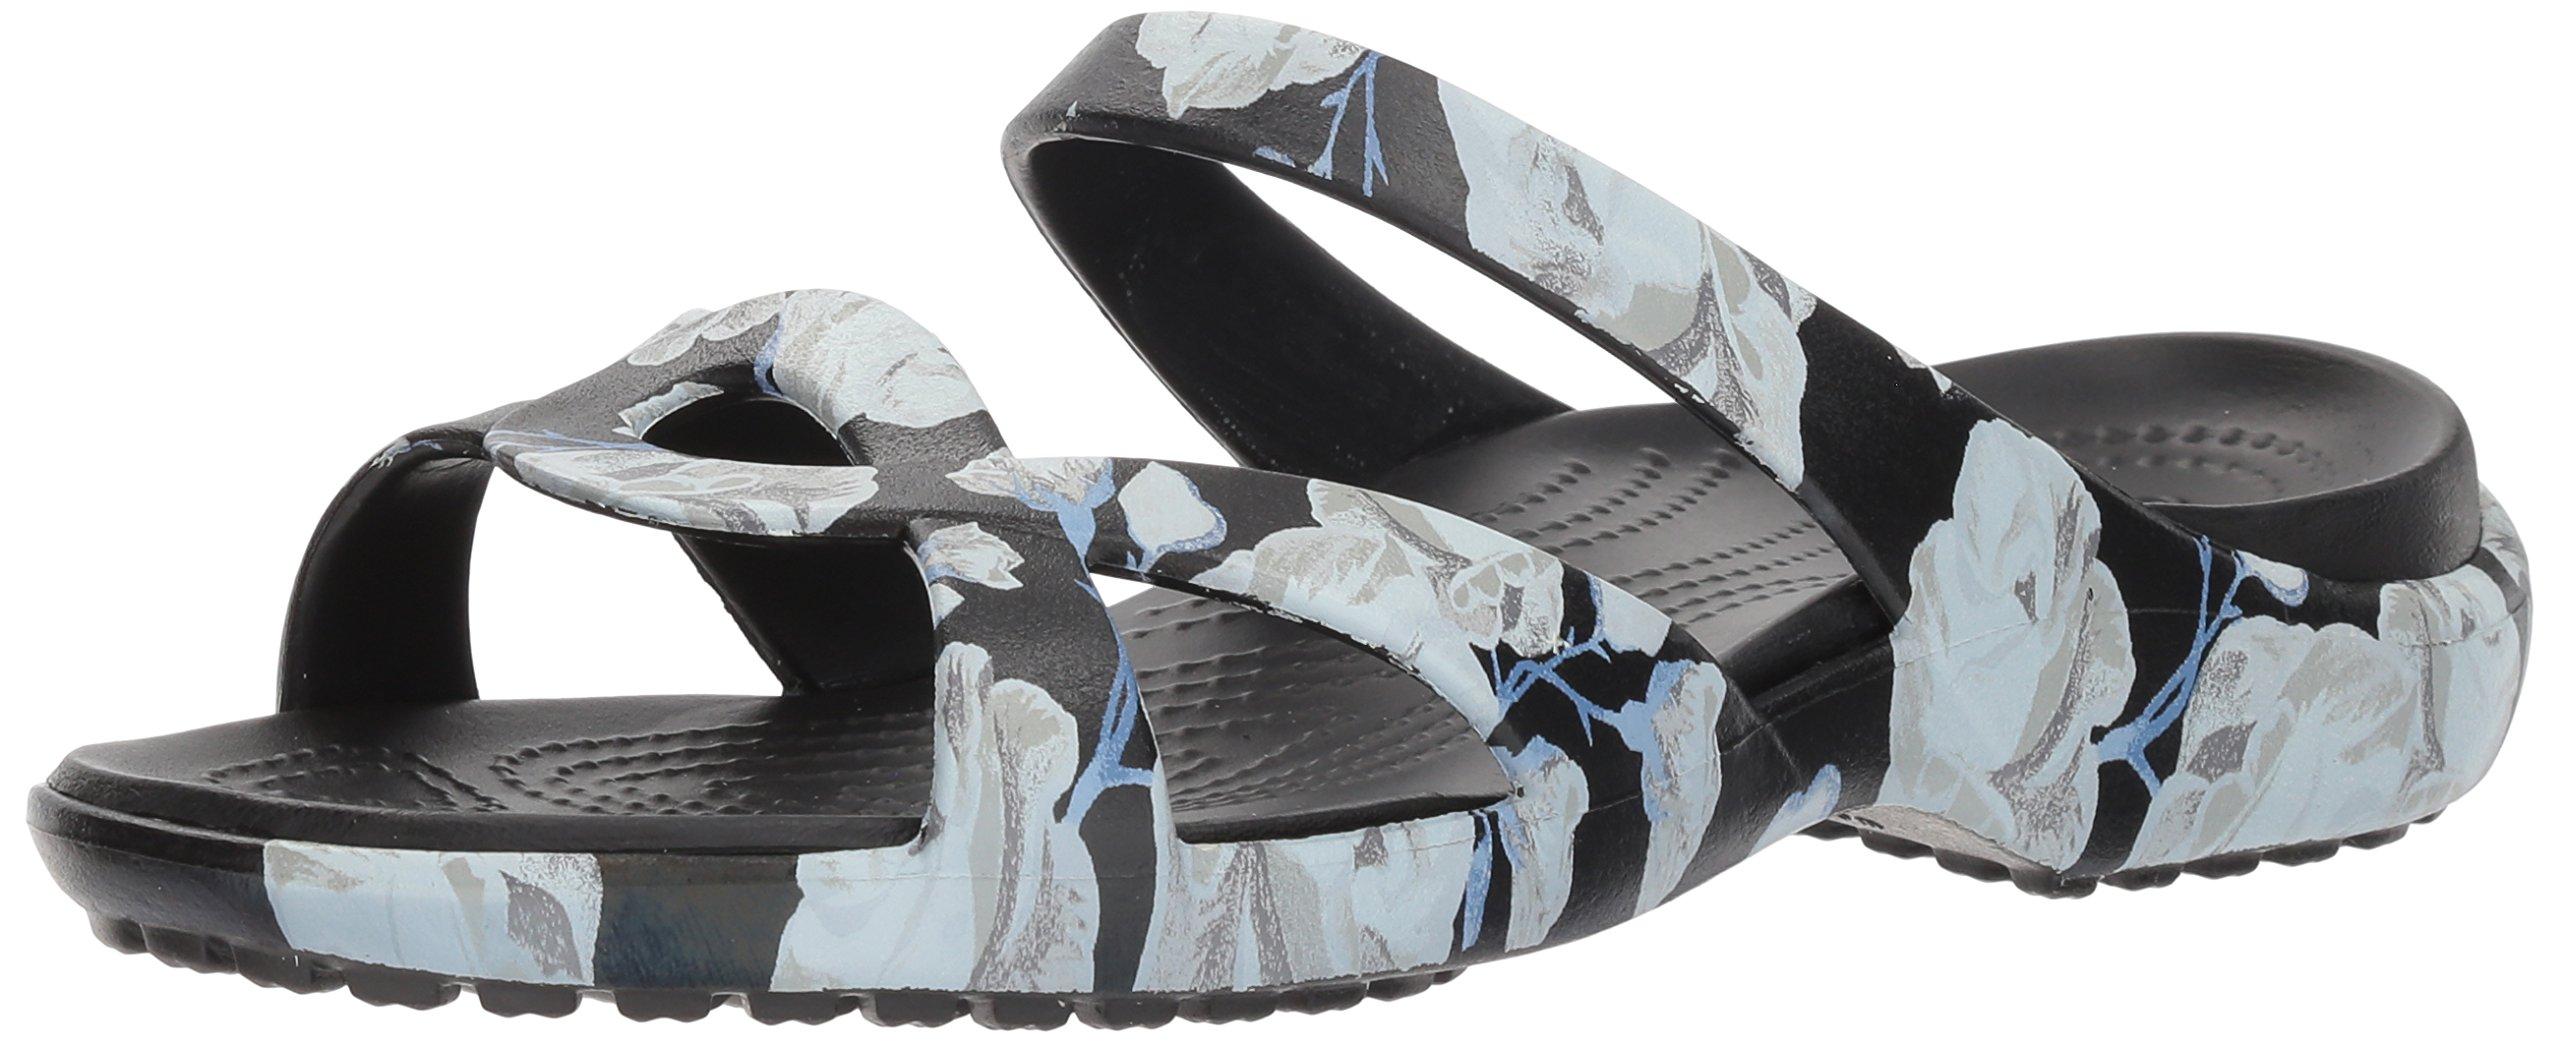 Crocs Women's Meleen Twist Graphic Flat Sandal, Rose/Black, 8 M US